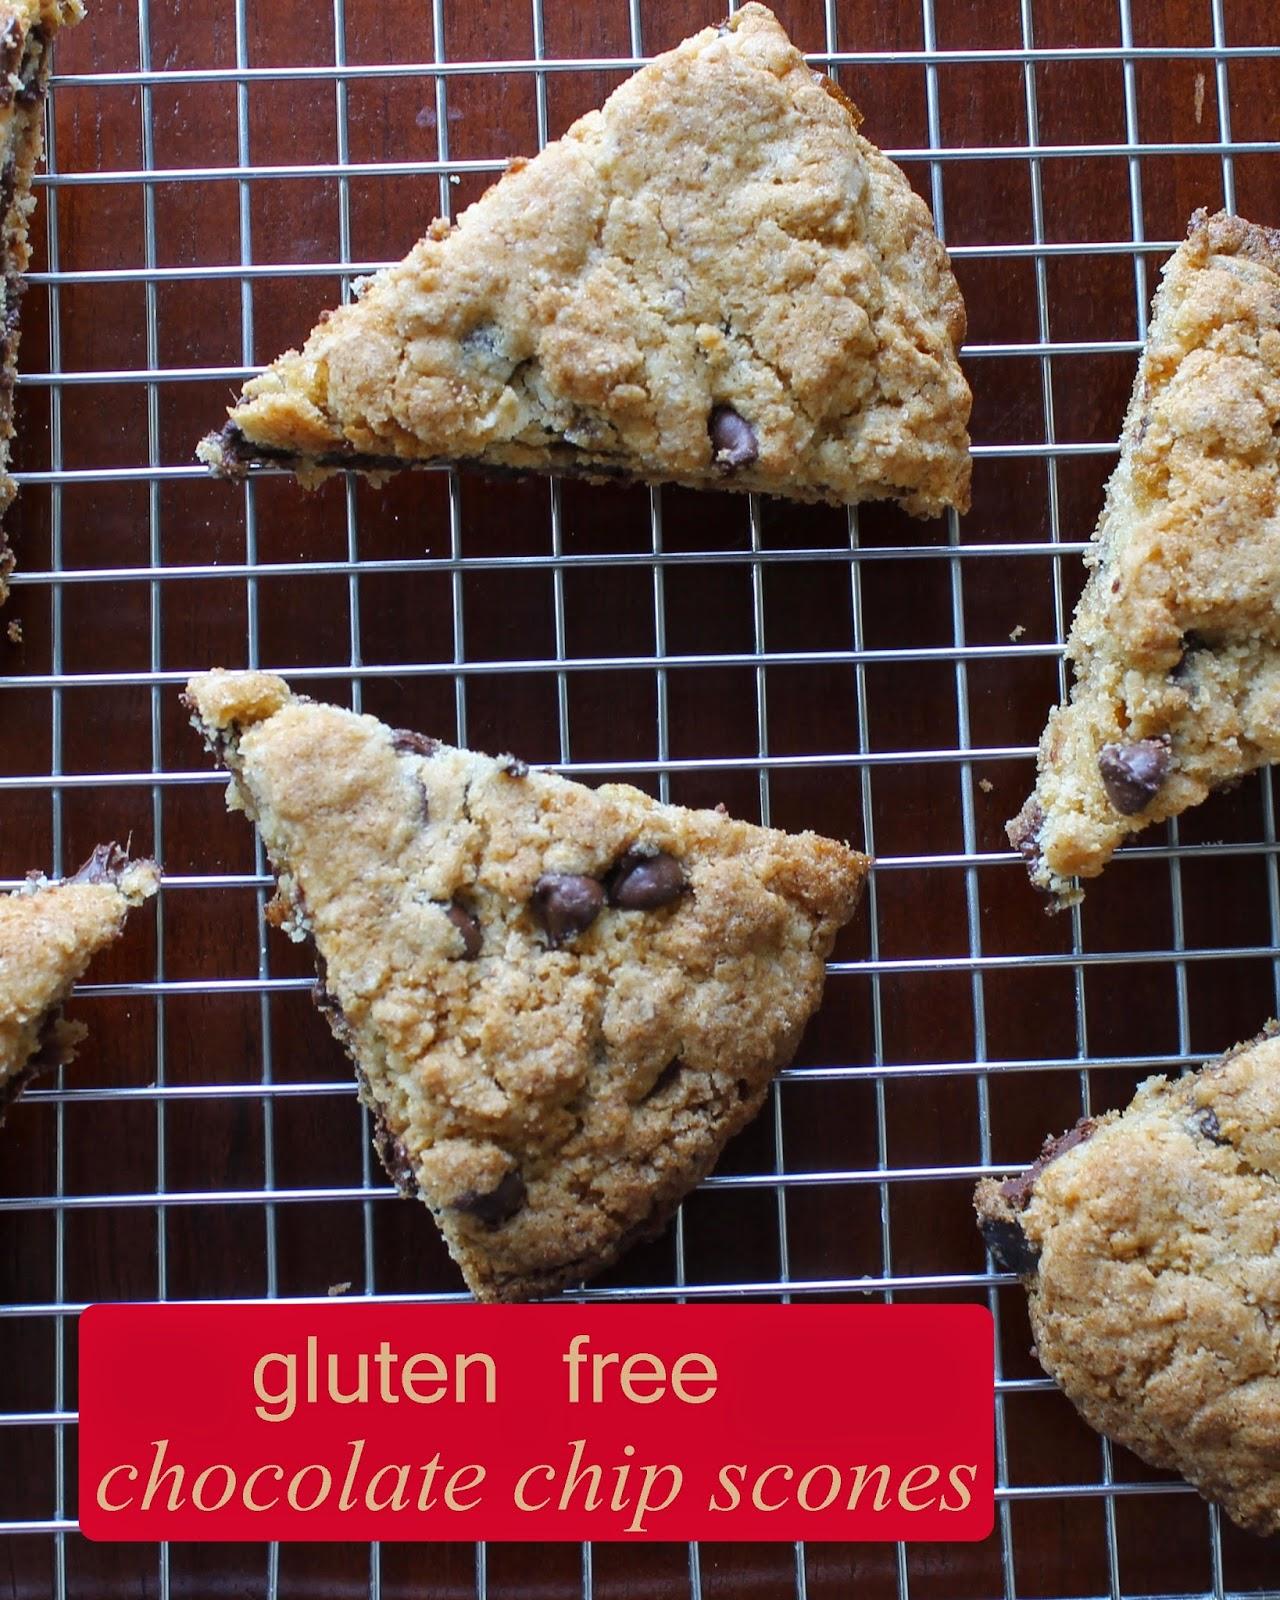 ... Bethany - The Best Gluten Free: Gluten Free Chocolate Chip Scones